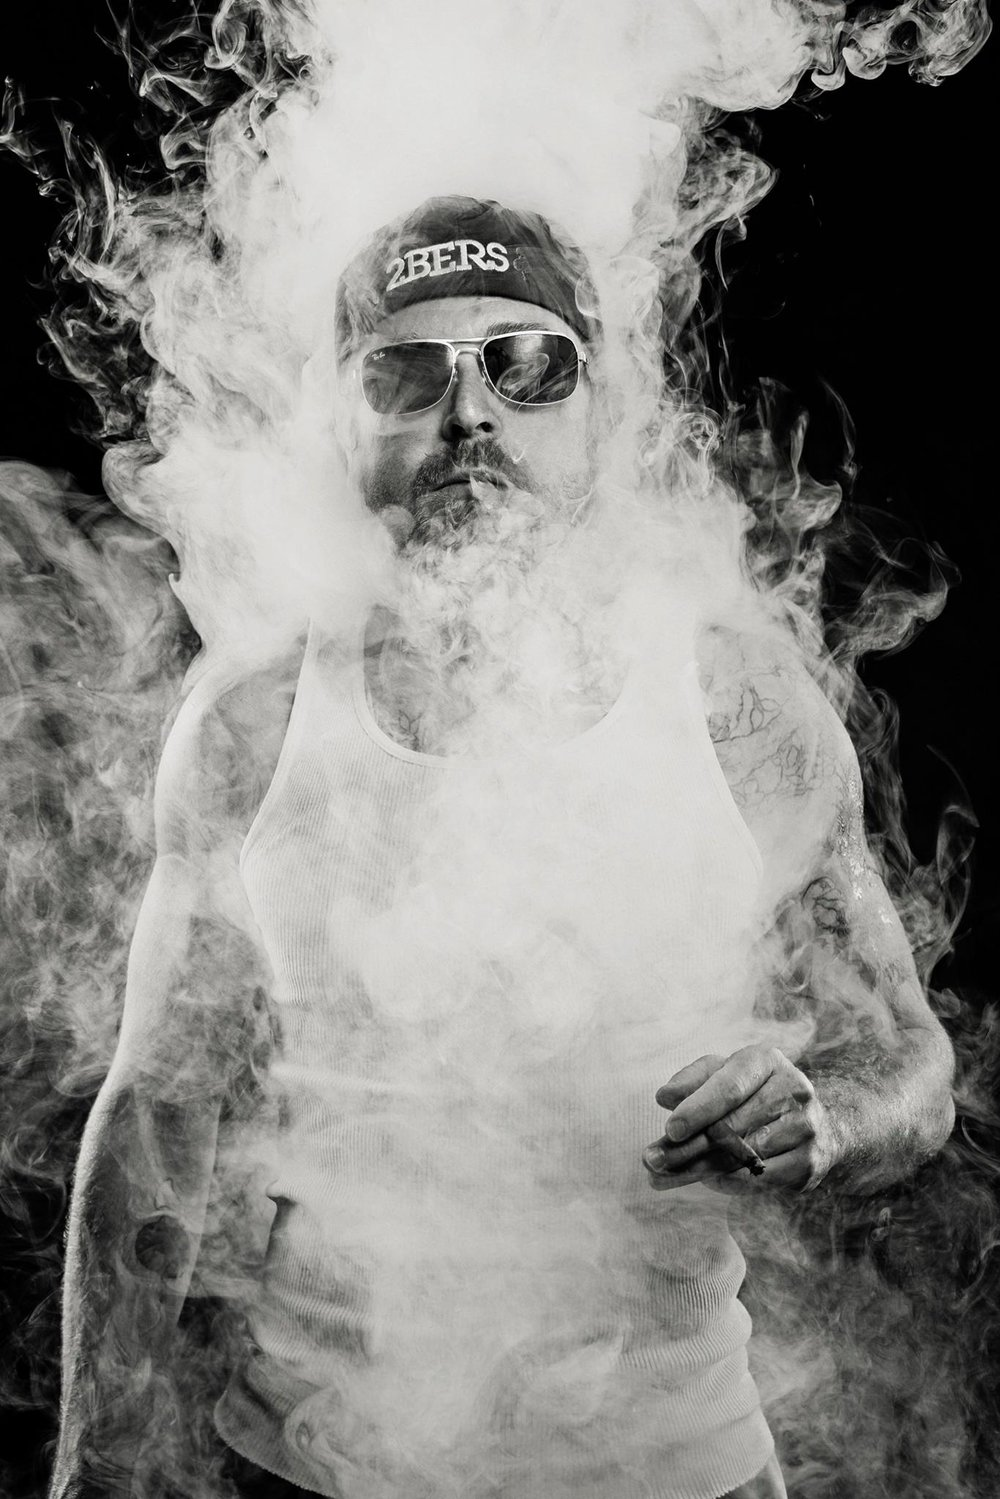 Bles Smoking-Wes Pic.jpg